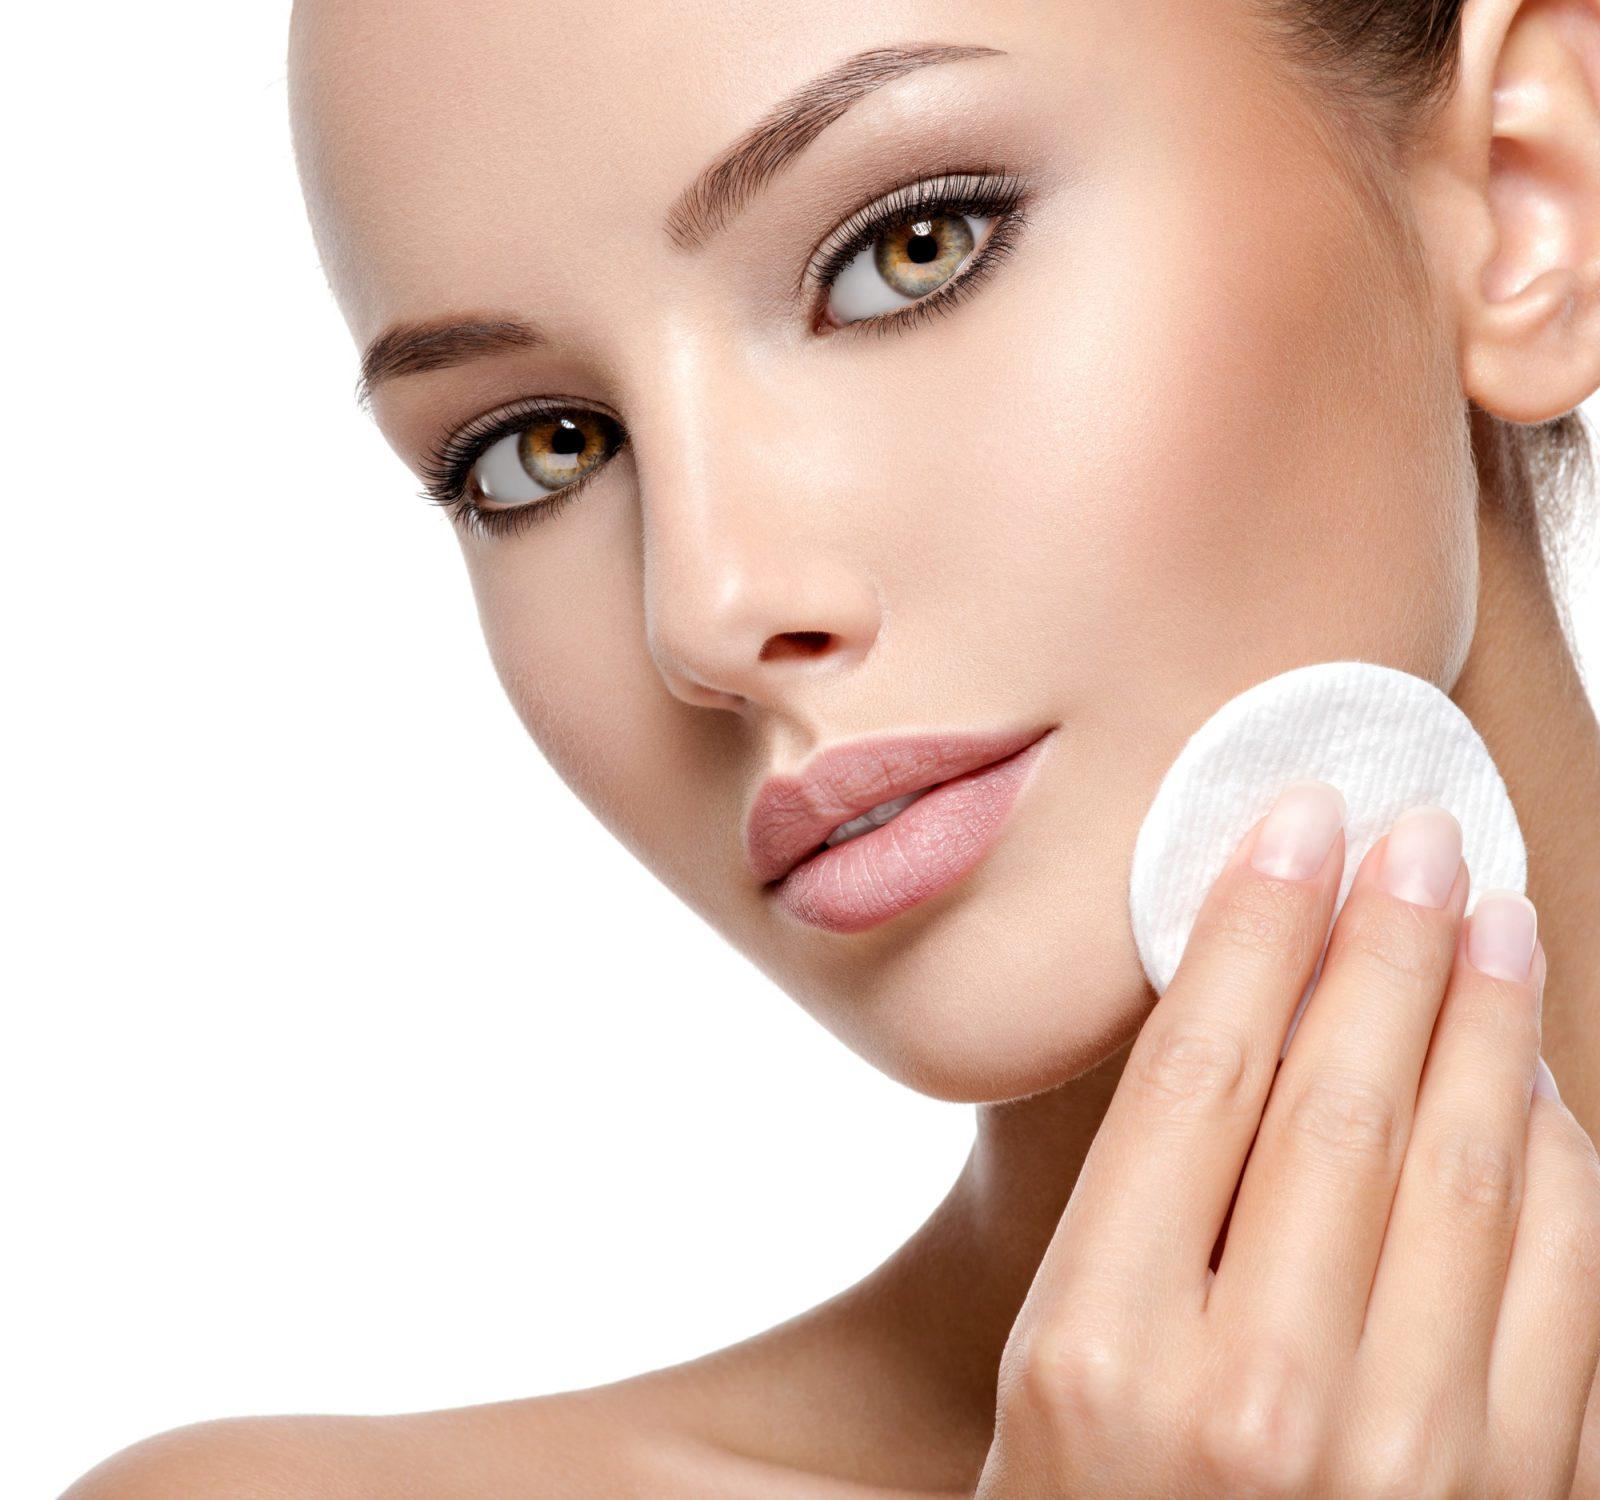 Cadeau-idee 2: Perfect Skin